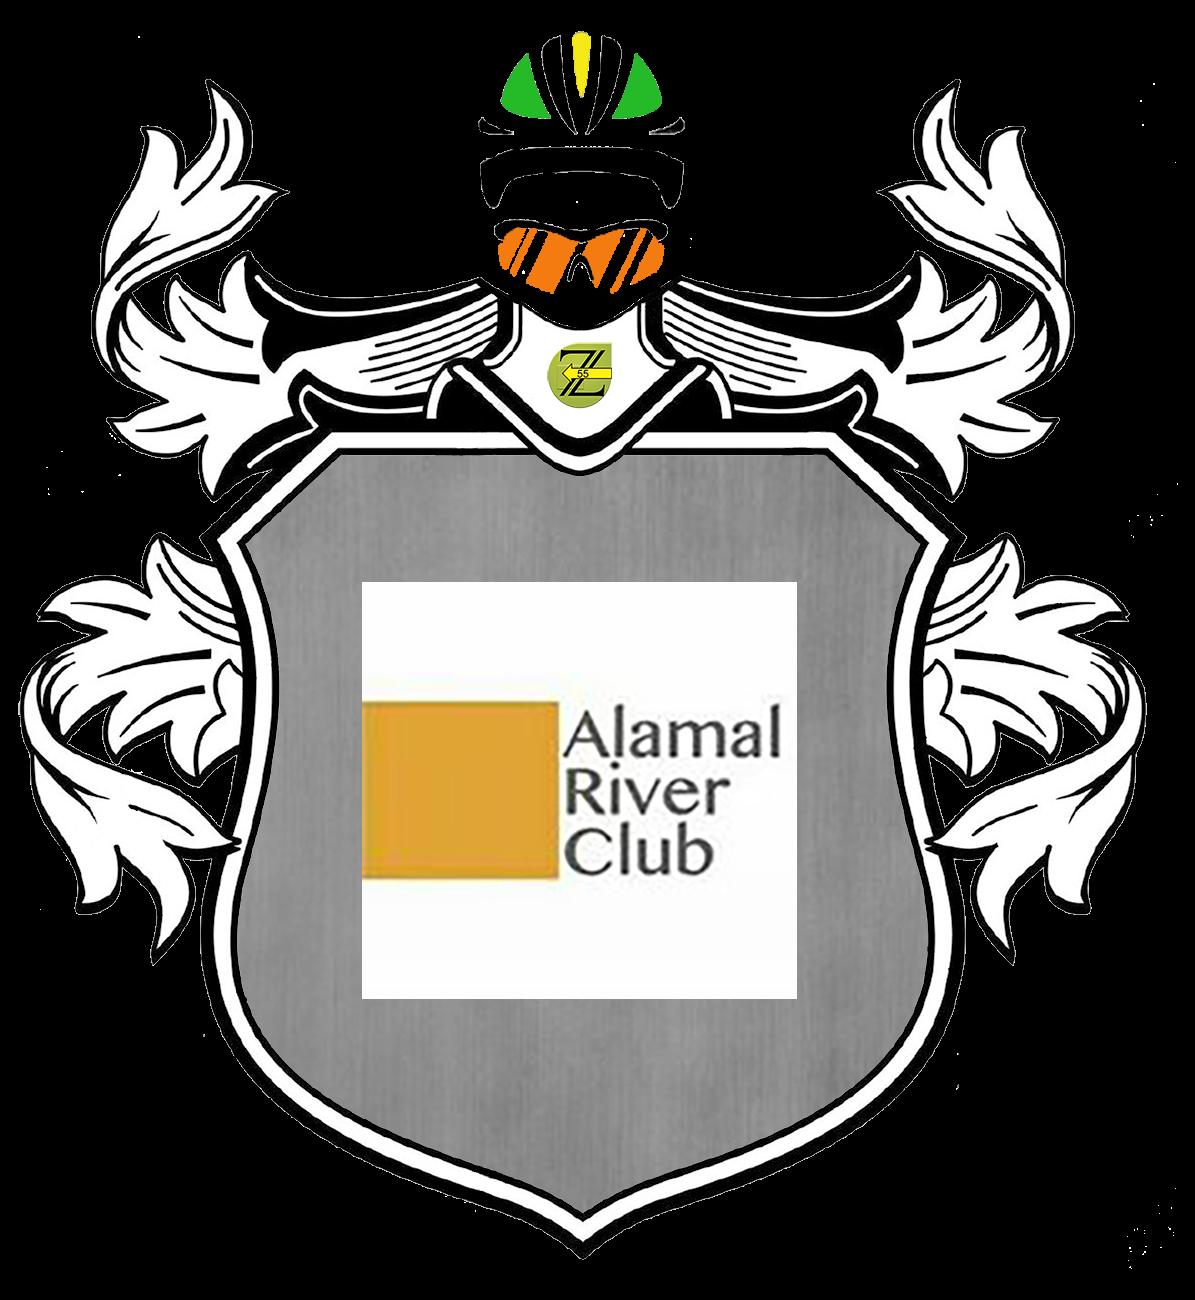 Alamal River Clube